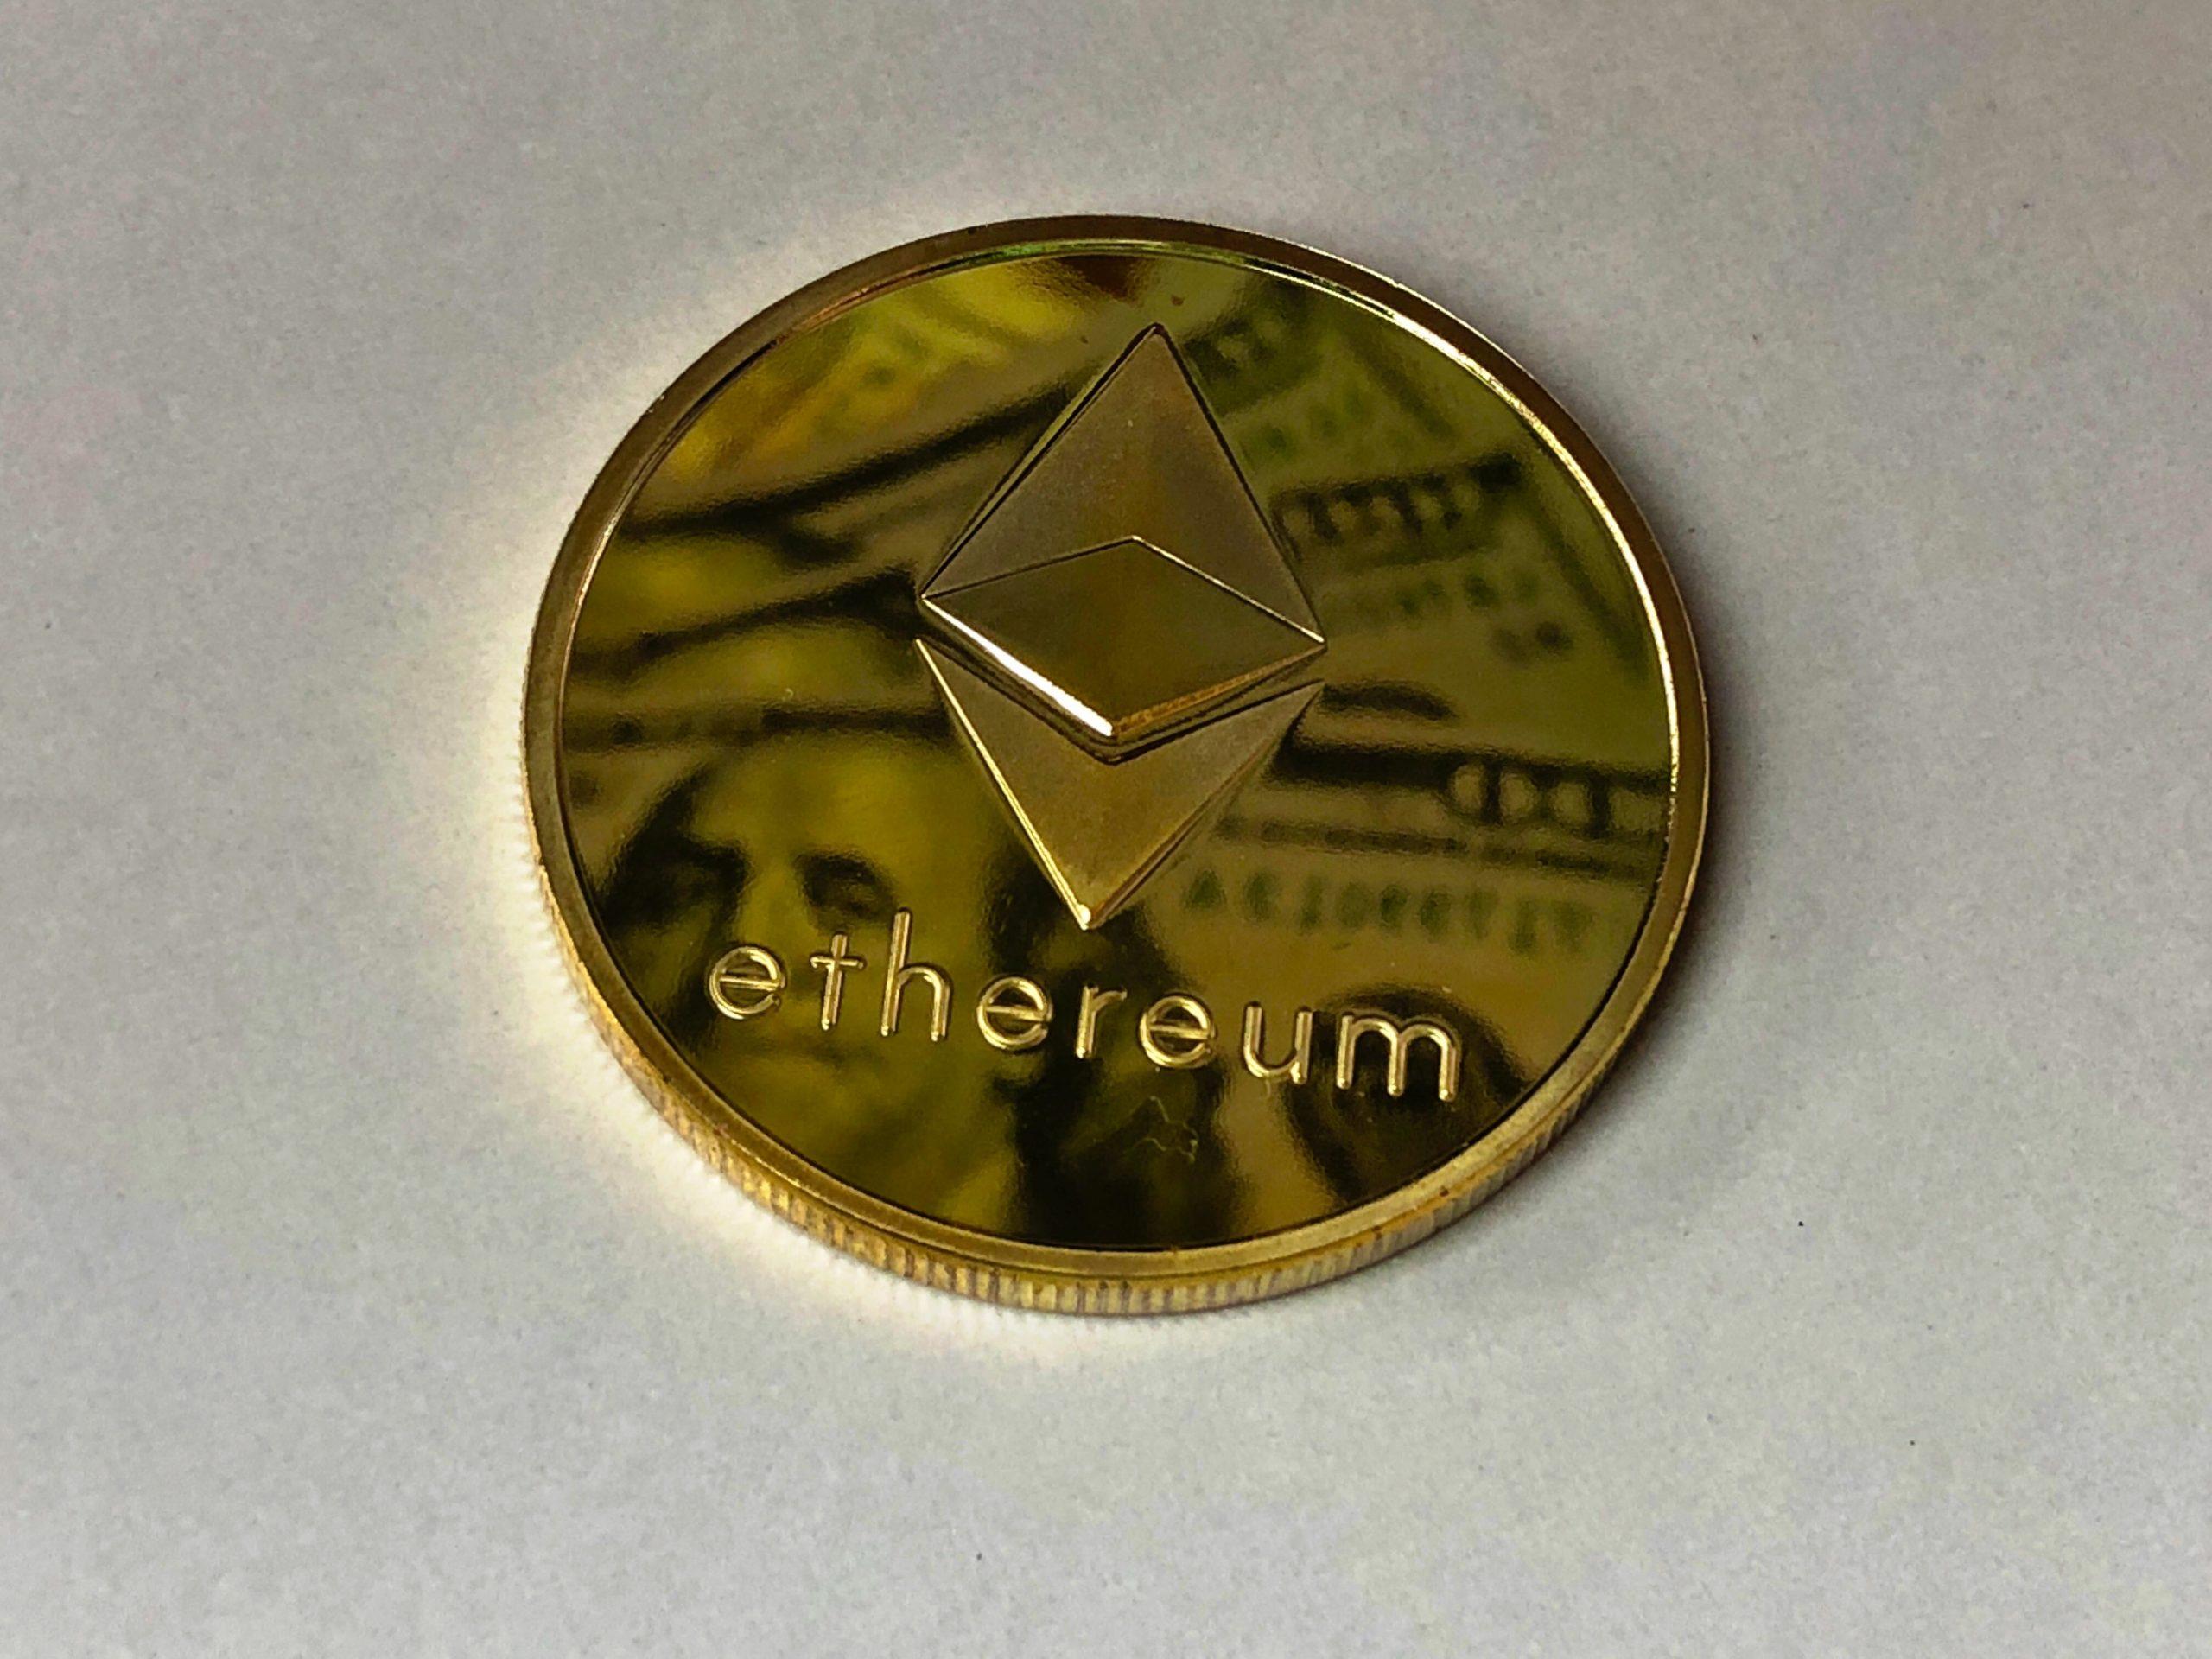 Ethereum gouden munt met Ethereum logo en ethereum tekst